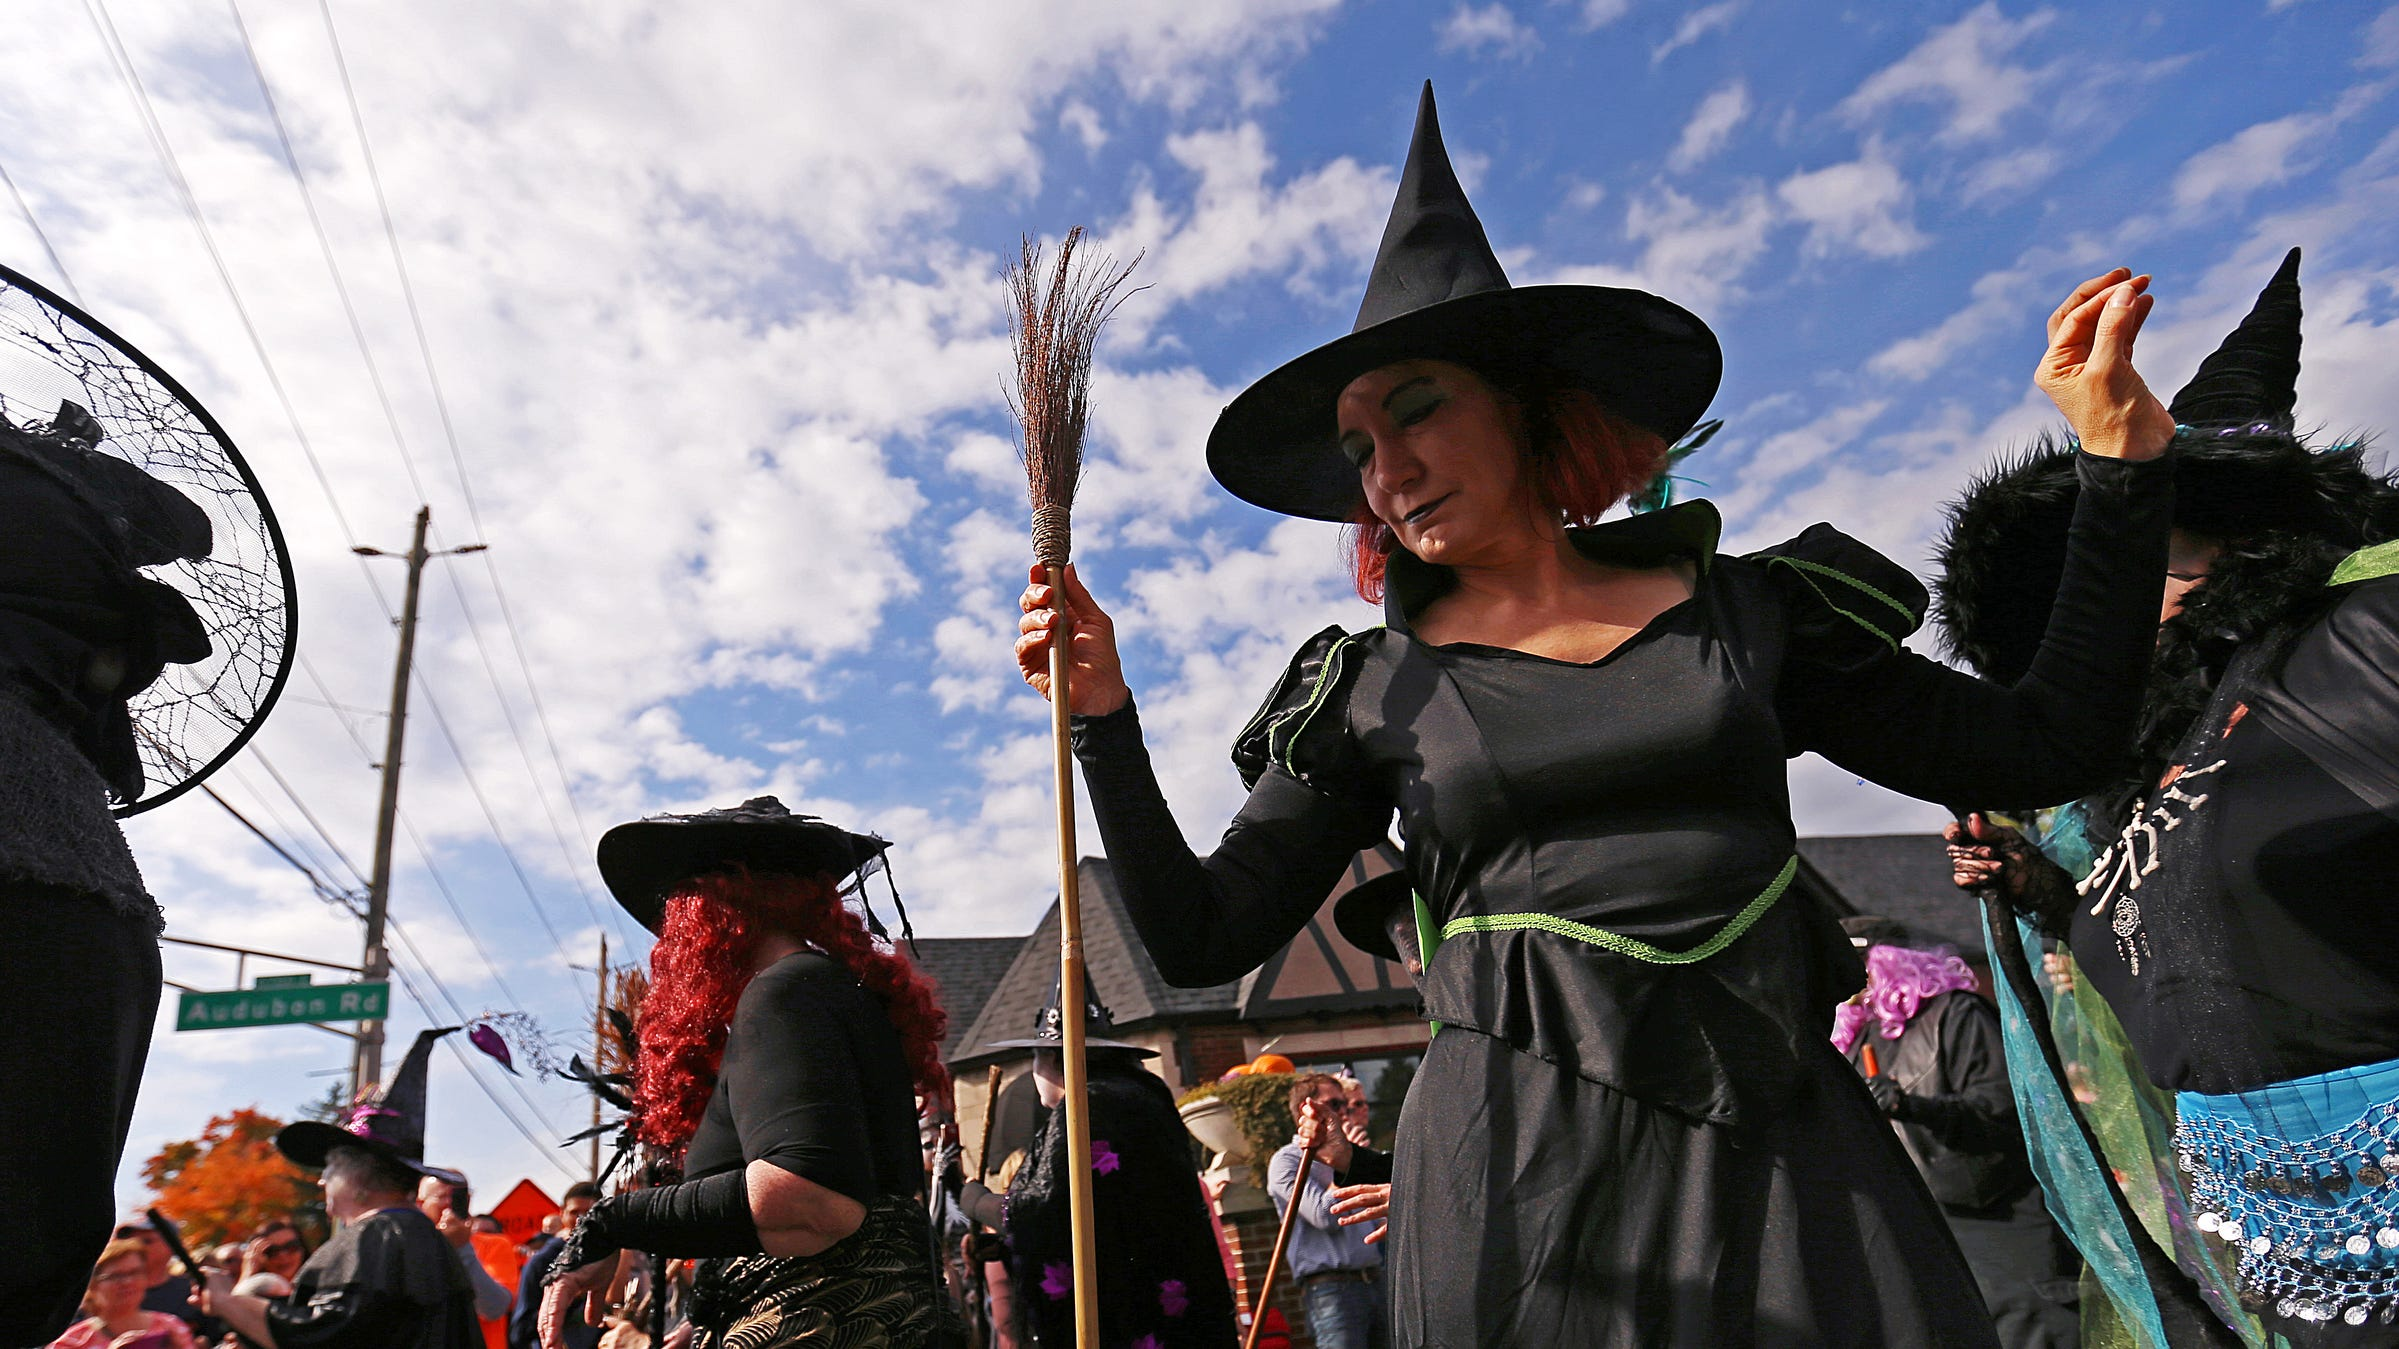 Itvington Halloween Vendors 2020 Historic Irvington Halloween Street Fair canceled